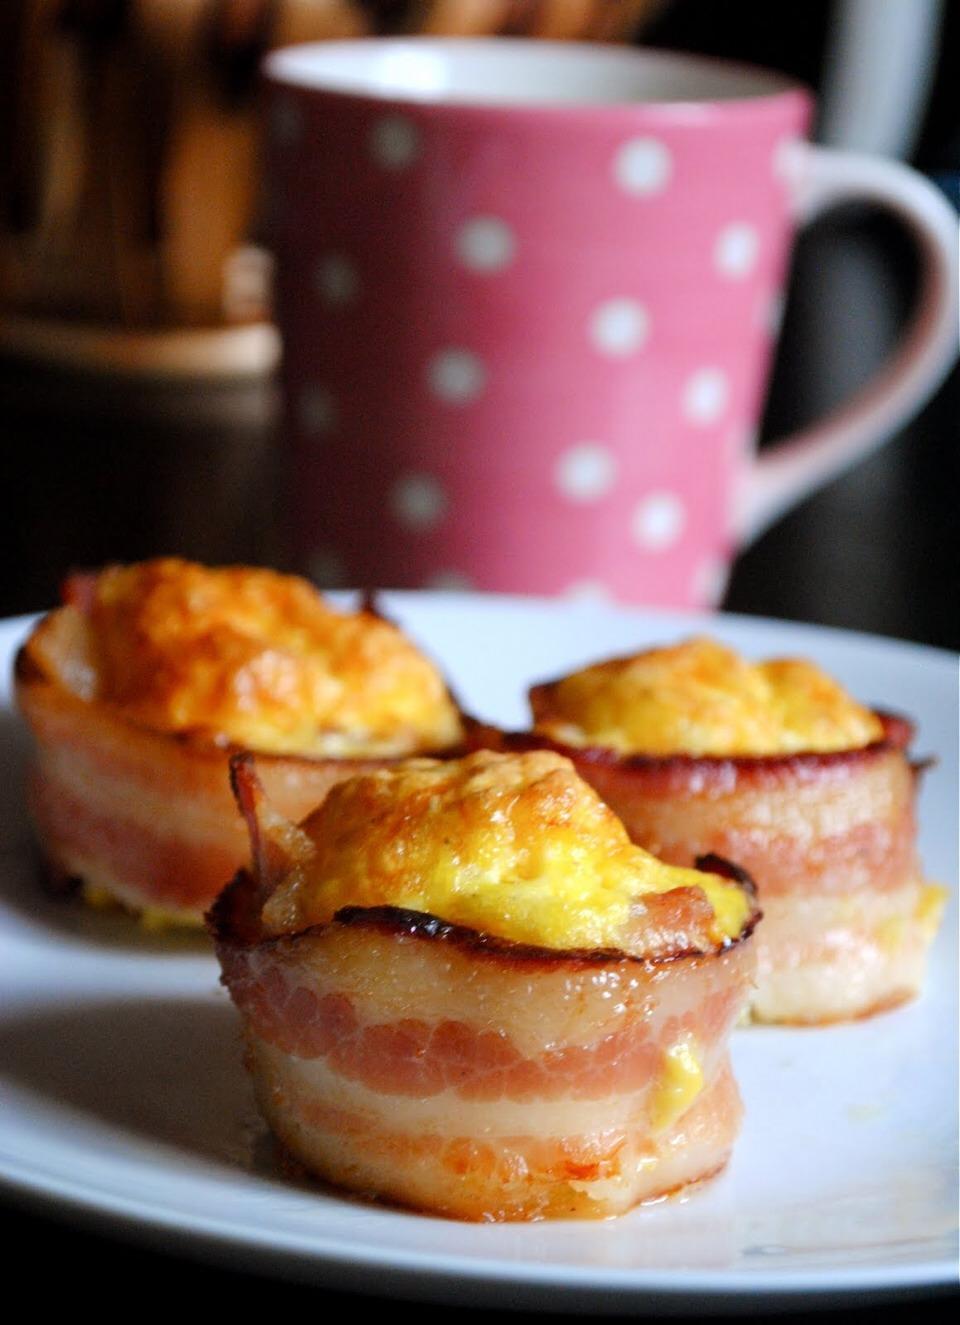 Bacon wrapped egg scramble